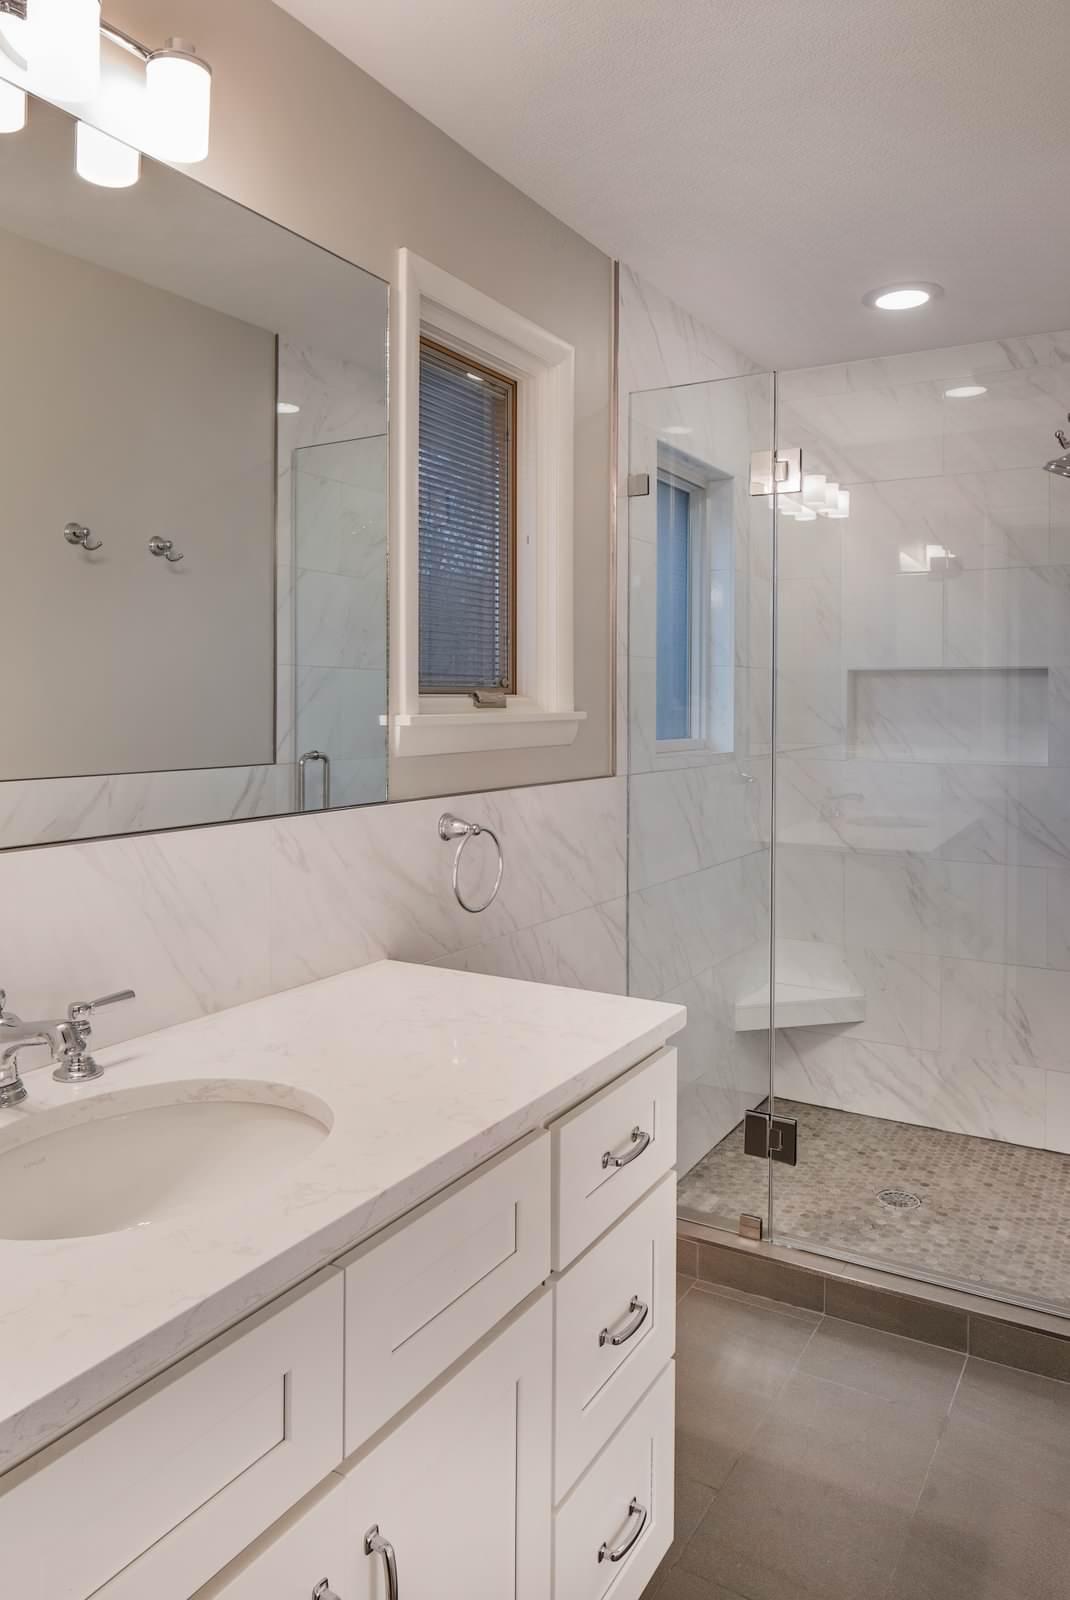 1960 Bathroom Remodel